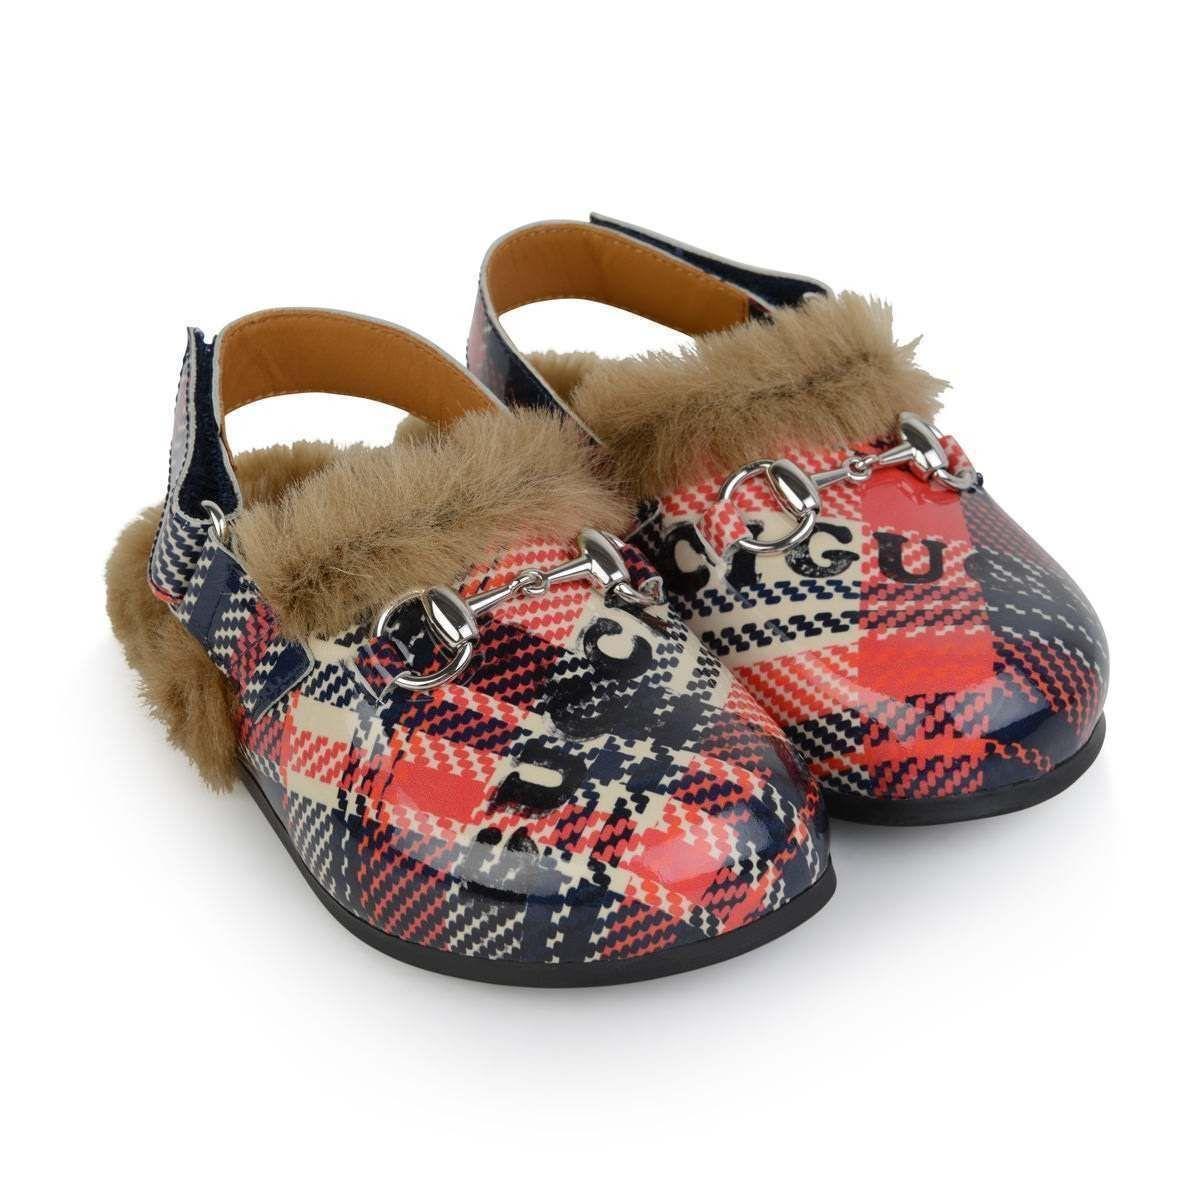 01833f14b GUCCI Horsebit Check Slipper Loafers | Kids BEST | Gucci horsebit ...